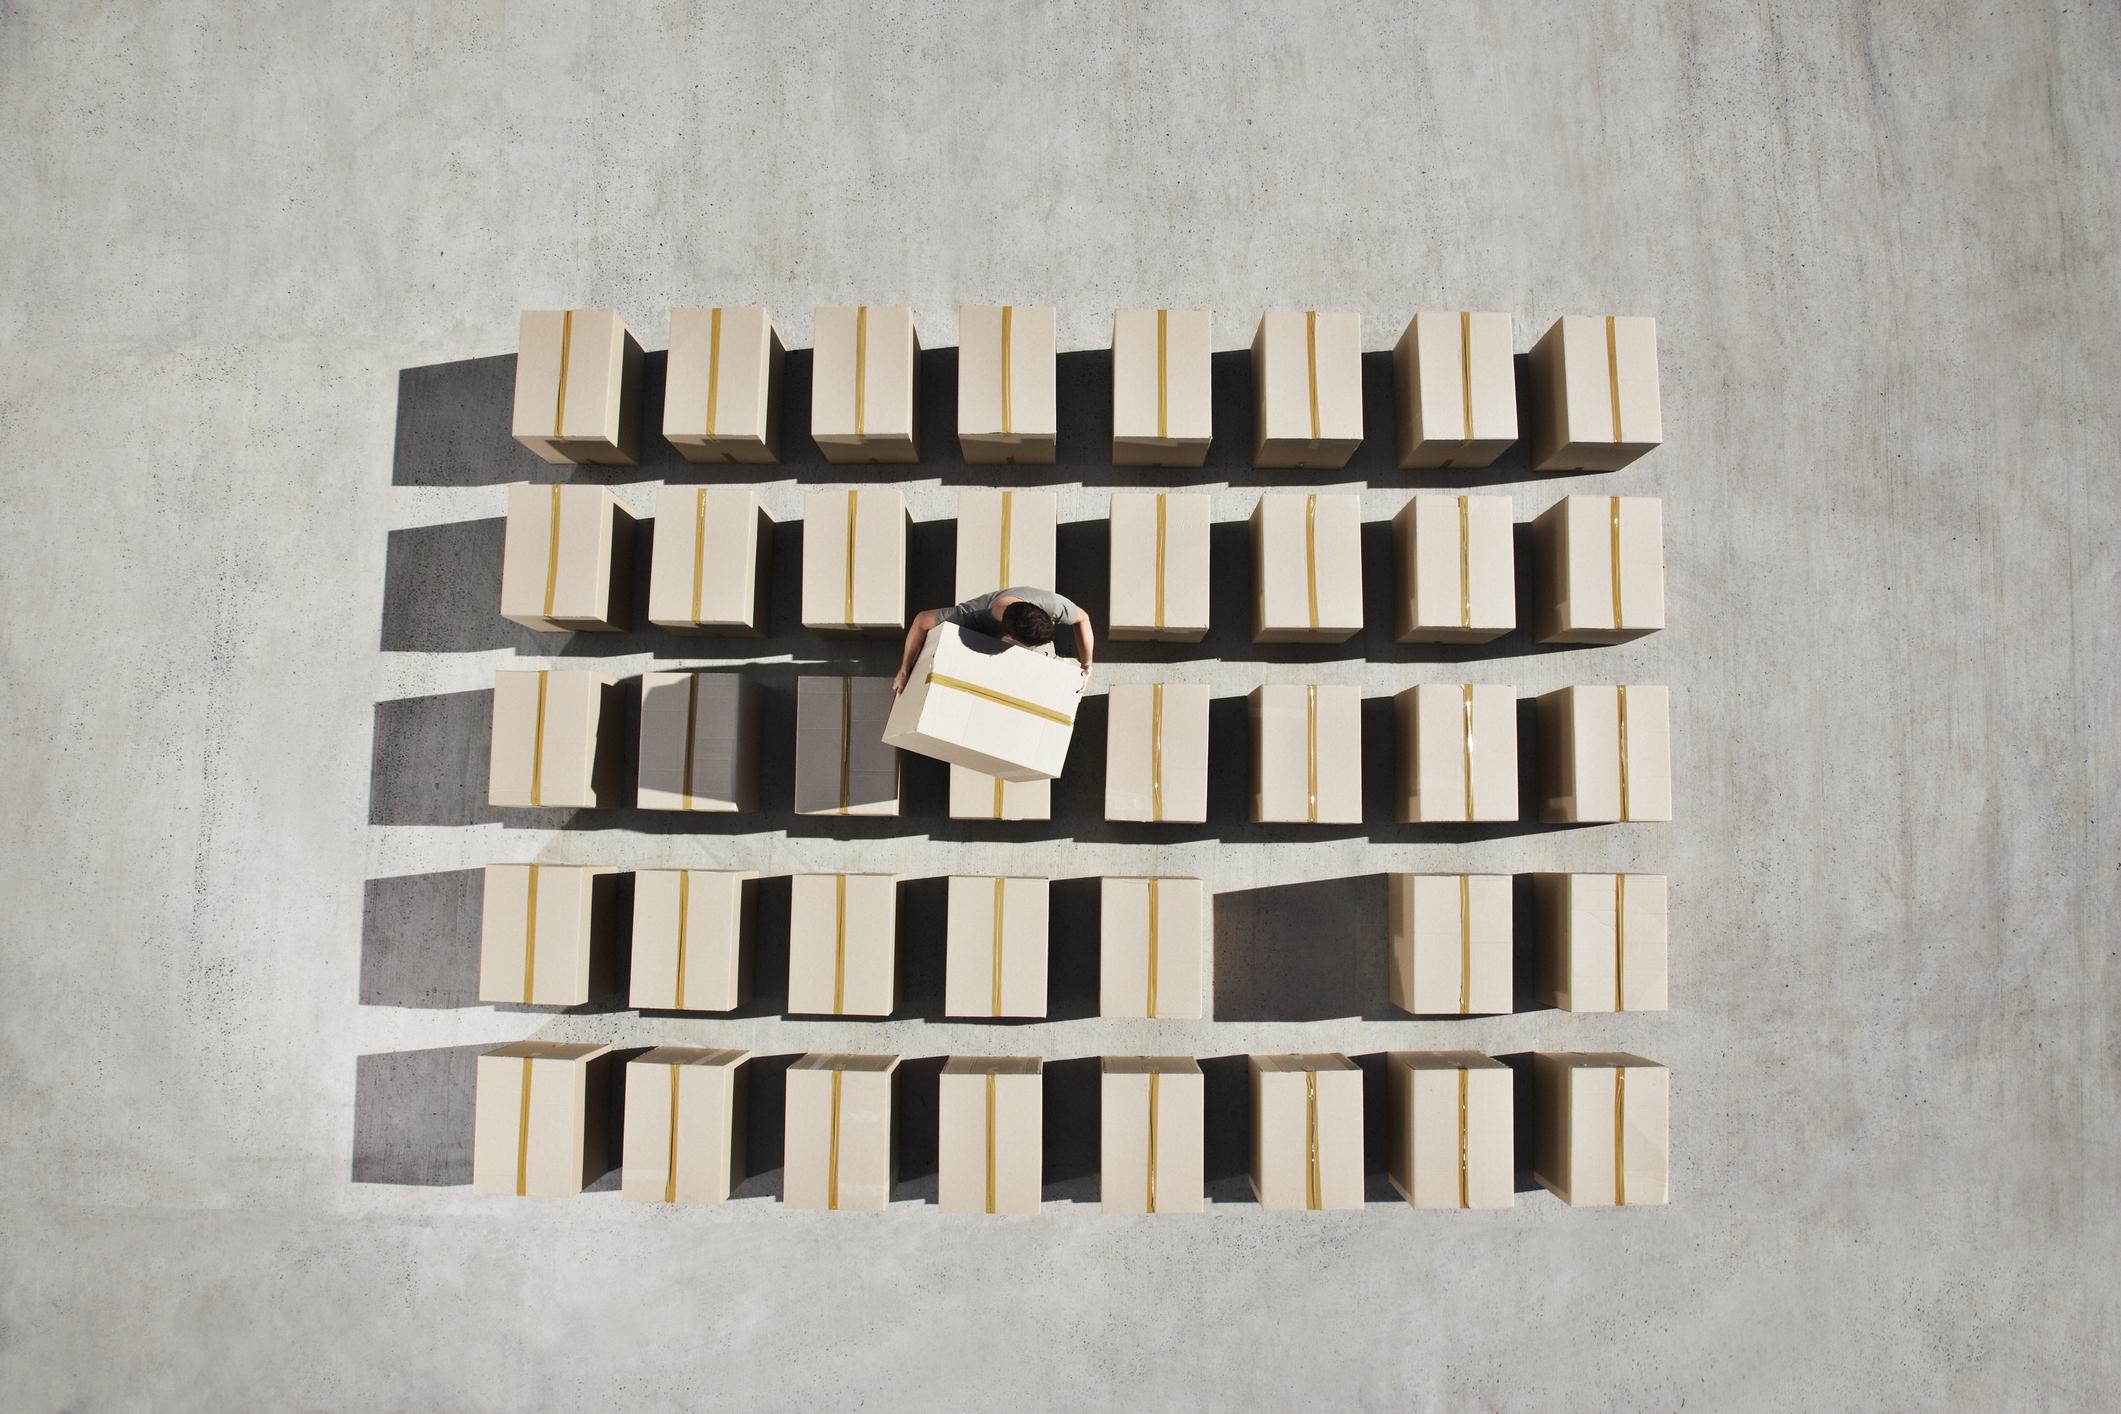 Man arranging boxes